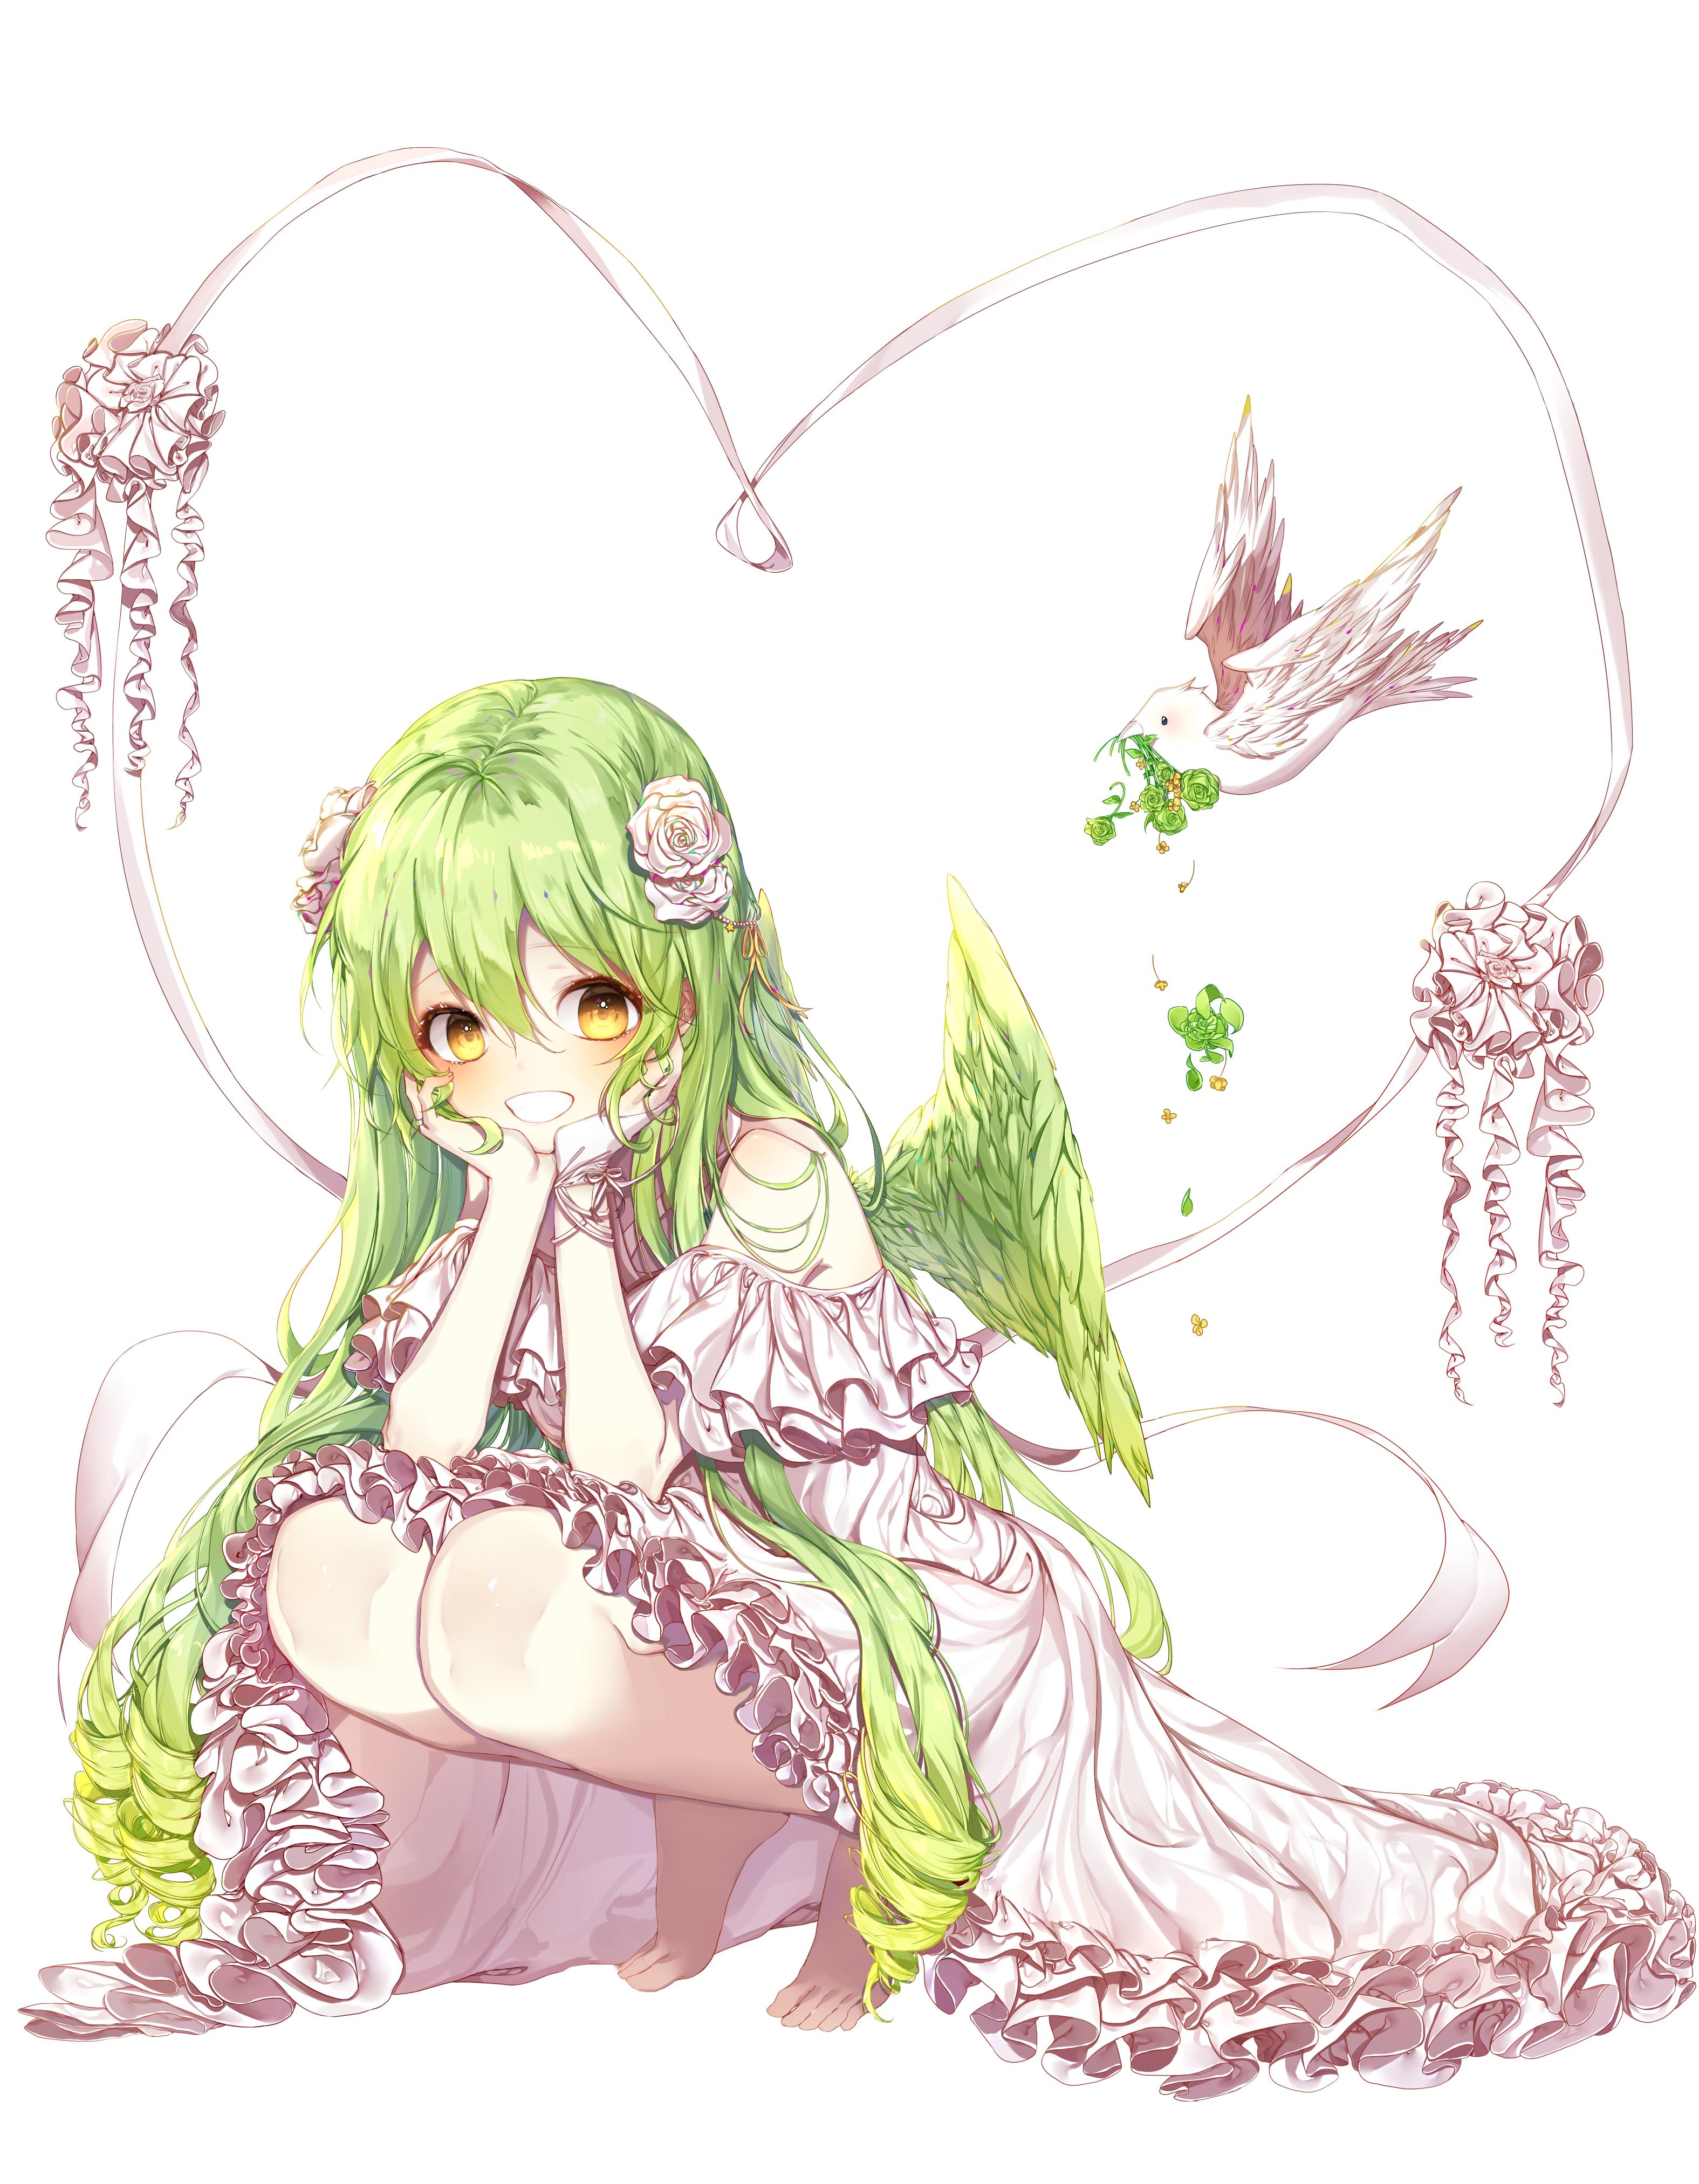 Wallpaper Anime Girls Original Characters Green Hair Flower In Hair 3150x4050 Richs 1554349 Hd Wallpapers Wallhere